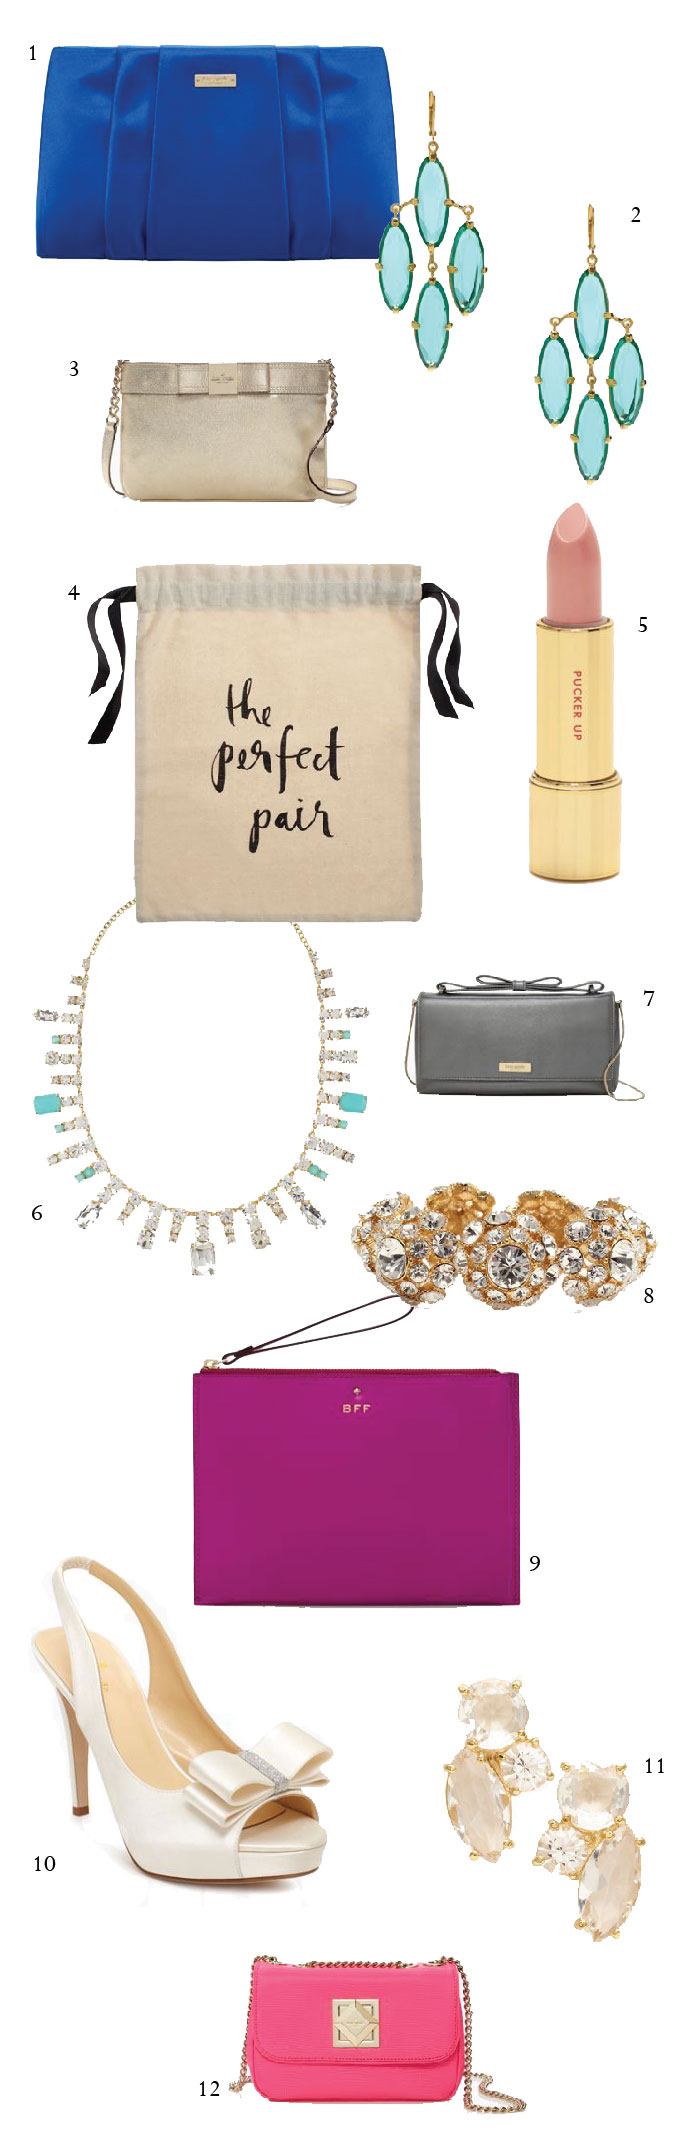 Sale, Kate Spade, Purses, Jewelry, Discount, Wedding